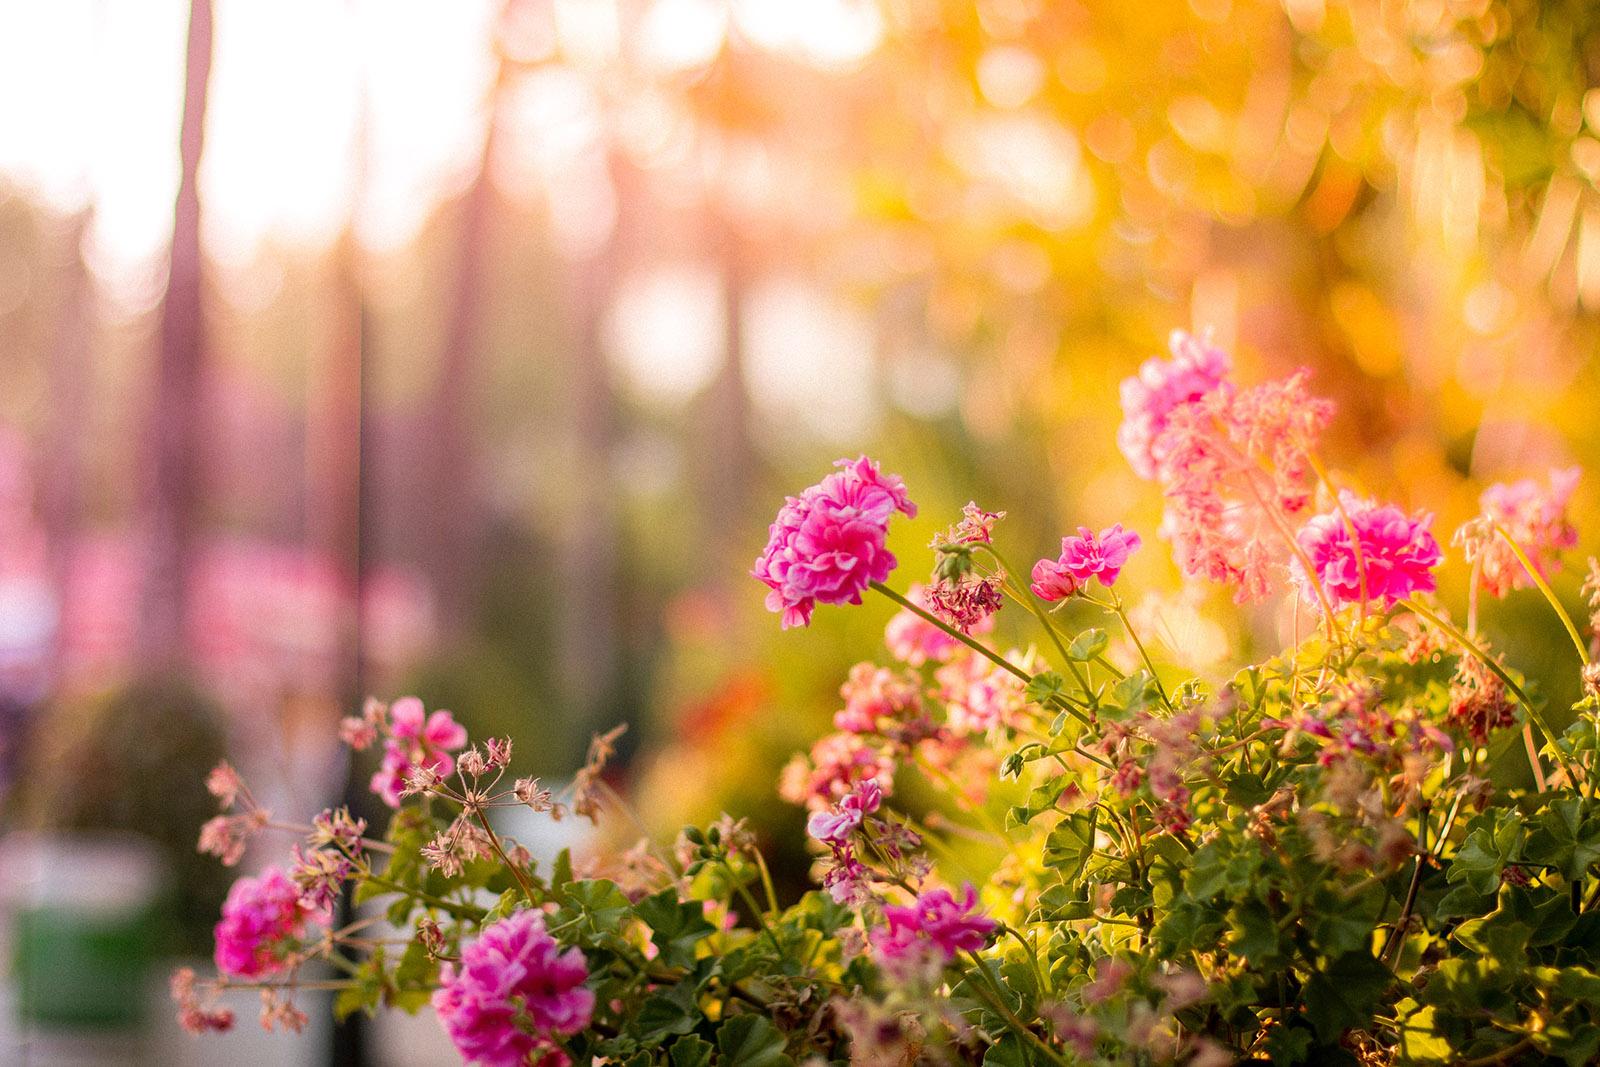 bloom-blossom-floral-17666